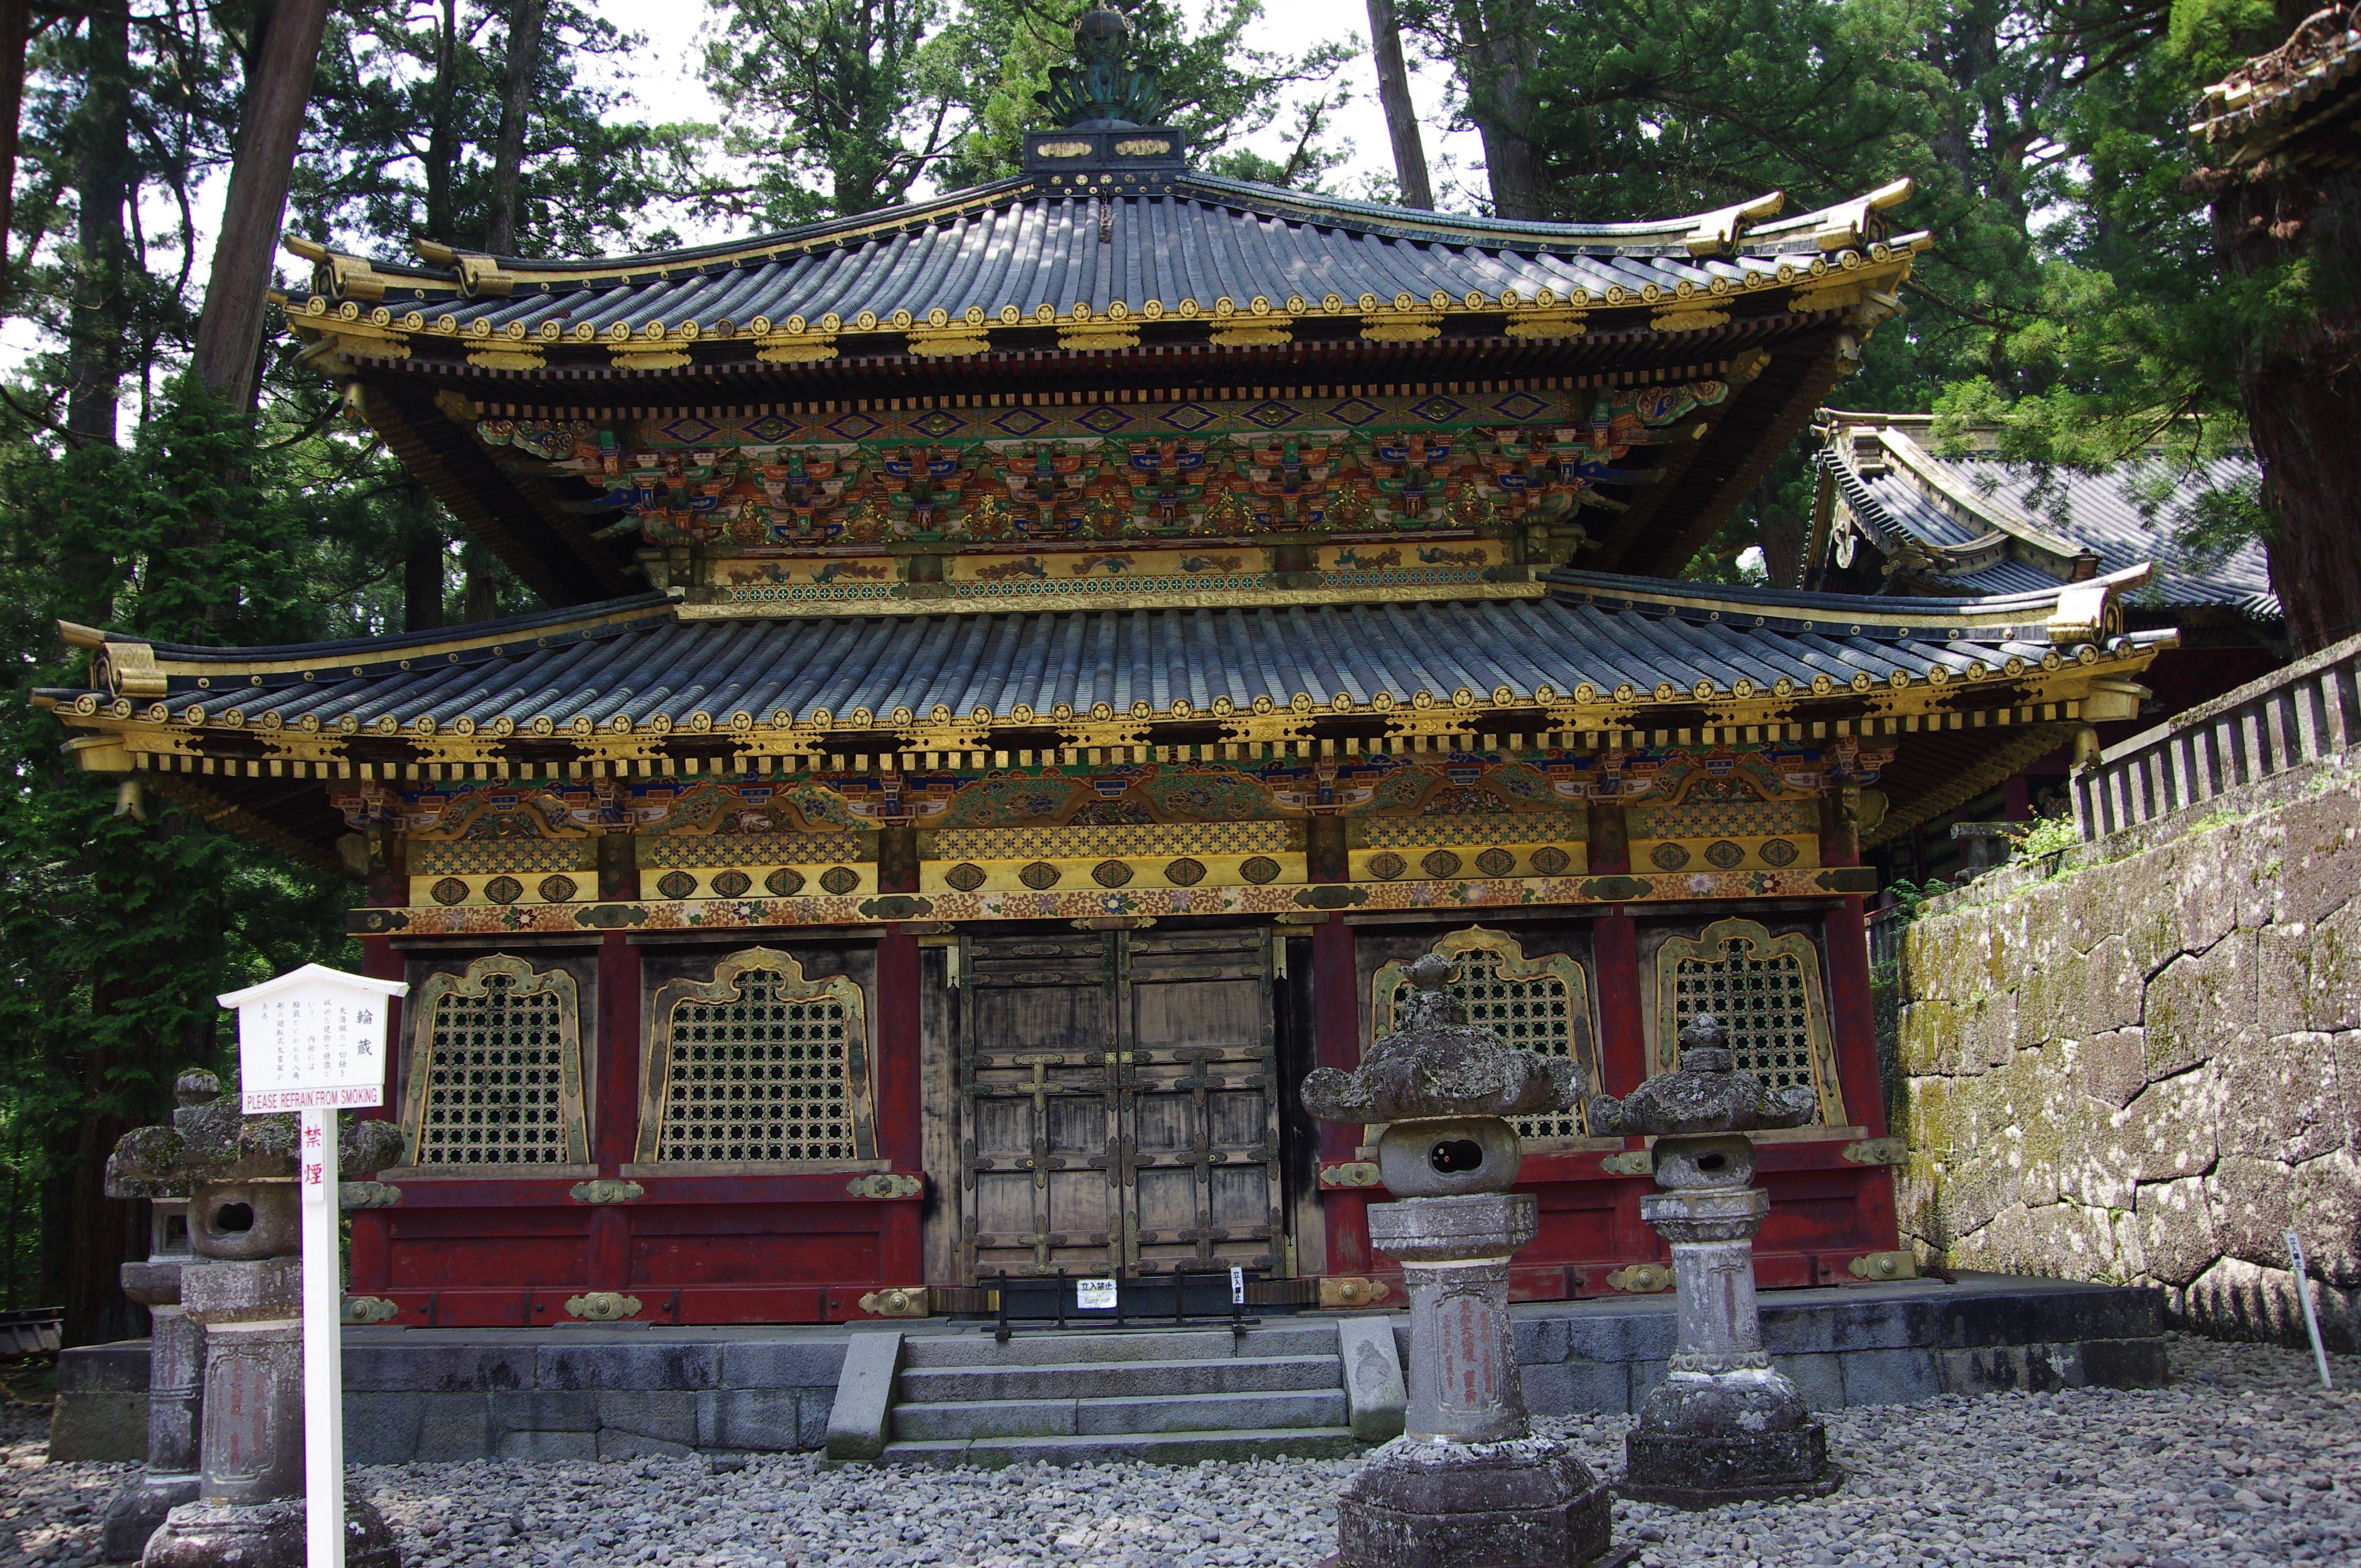 Nikko - Toshogu Shrine | Our trip to Japan - Viatge a Japó ...